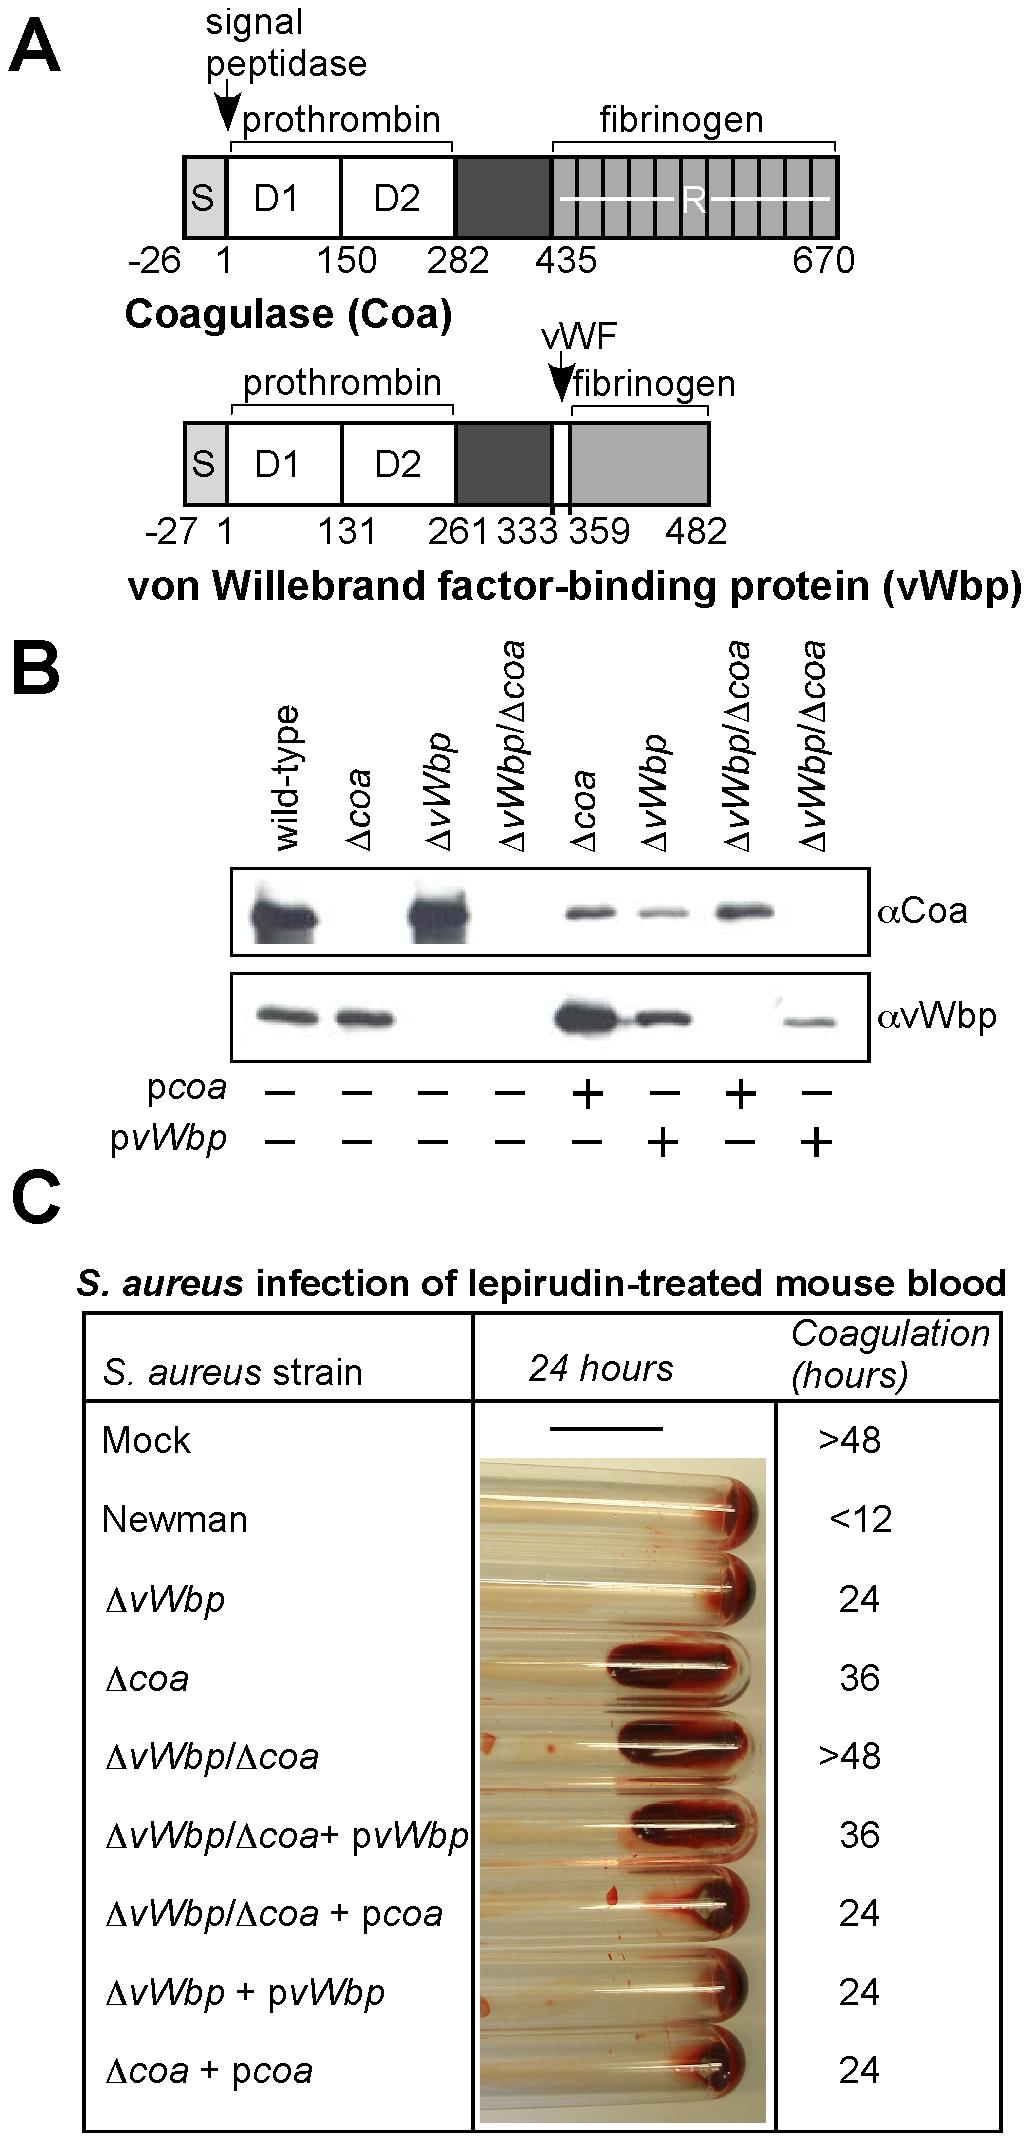 <i>Staphylococcus aureus coa</i> and <i>vWbp</i> mutants display defects in blood clotting.